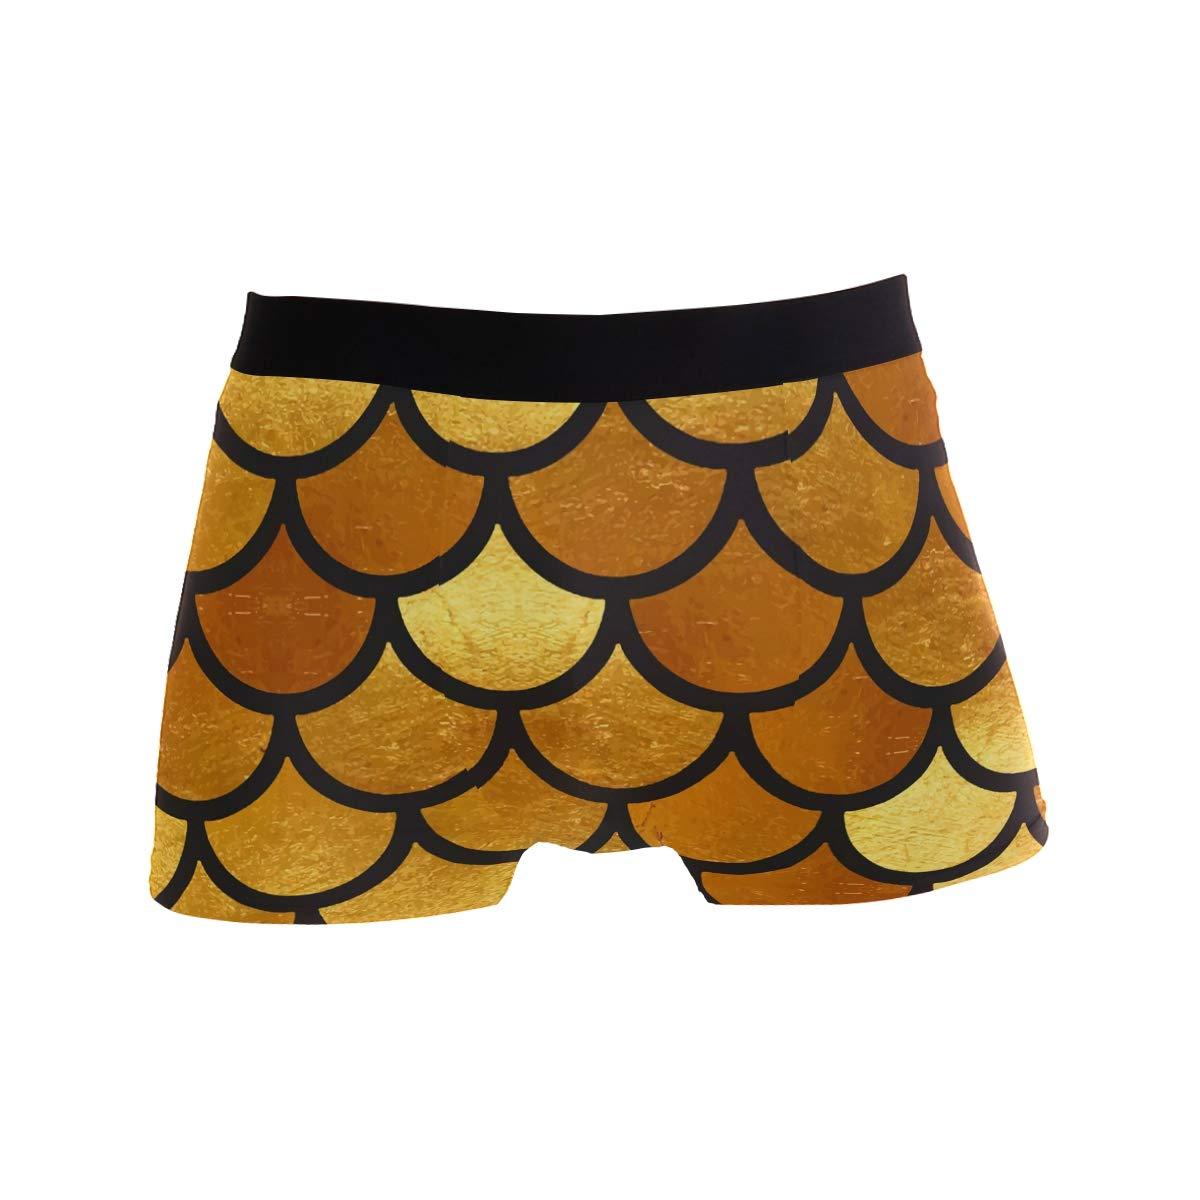 Sea Fish Mermaid Golden Short Underwear Soft Stretch Underpants for Men Boys S-XL BETTKEN Mens Boxer Briefs